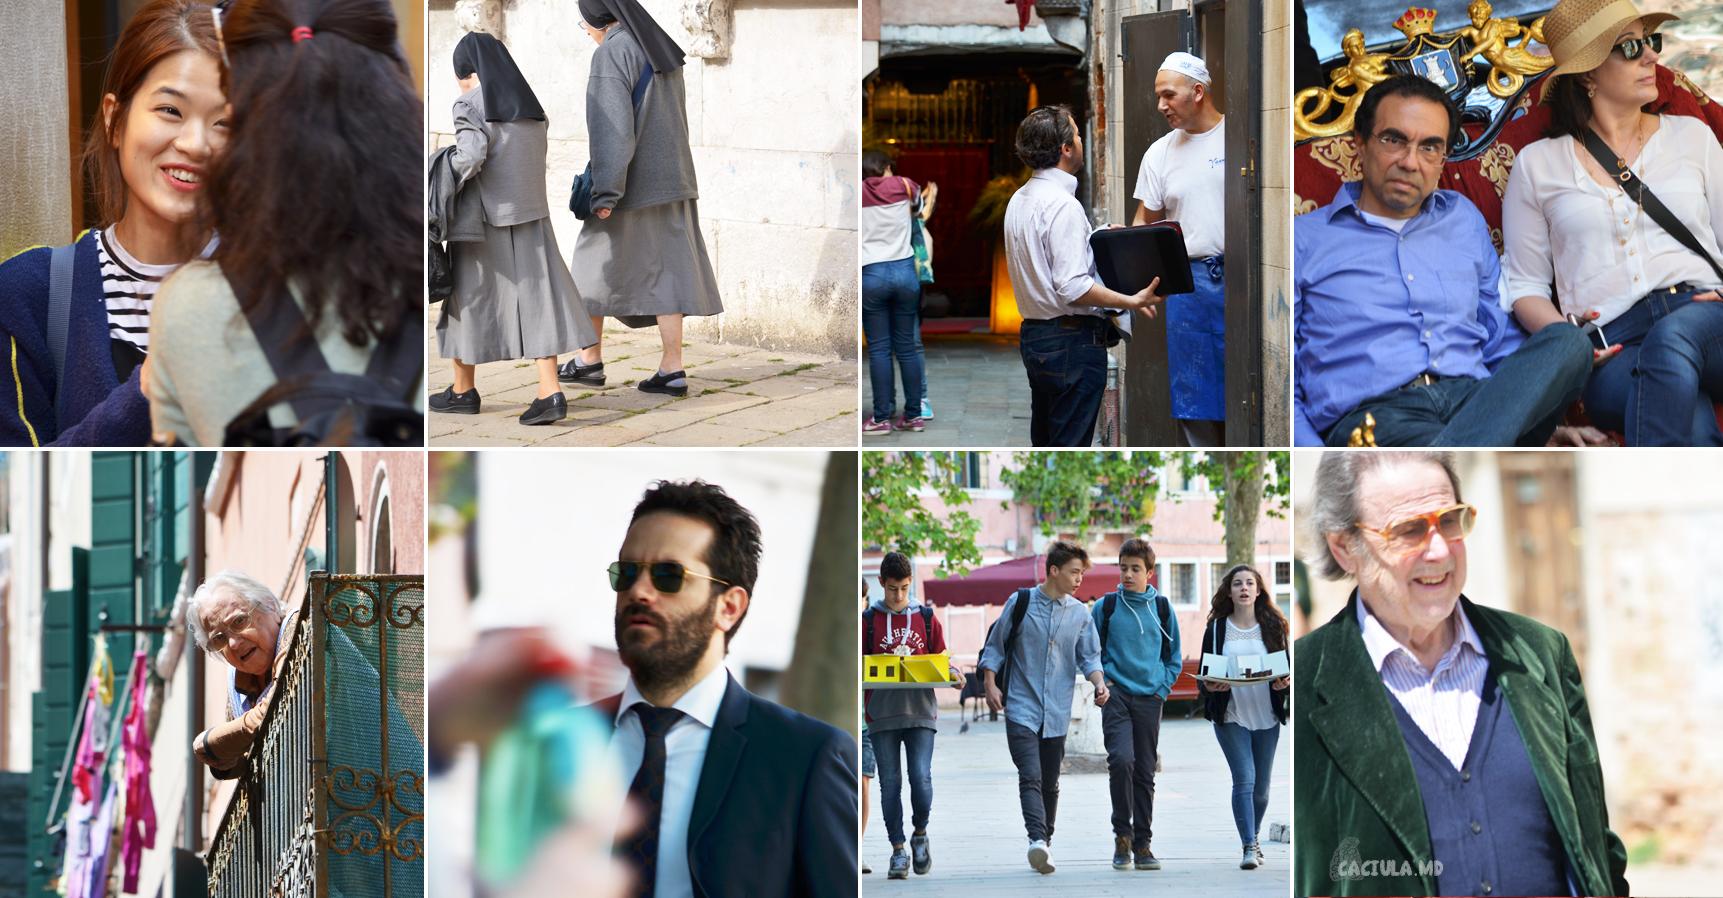 collage_people_venecia_caciula